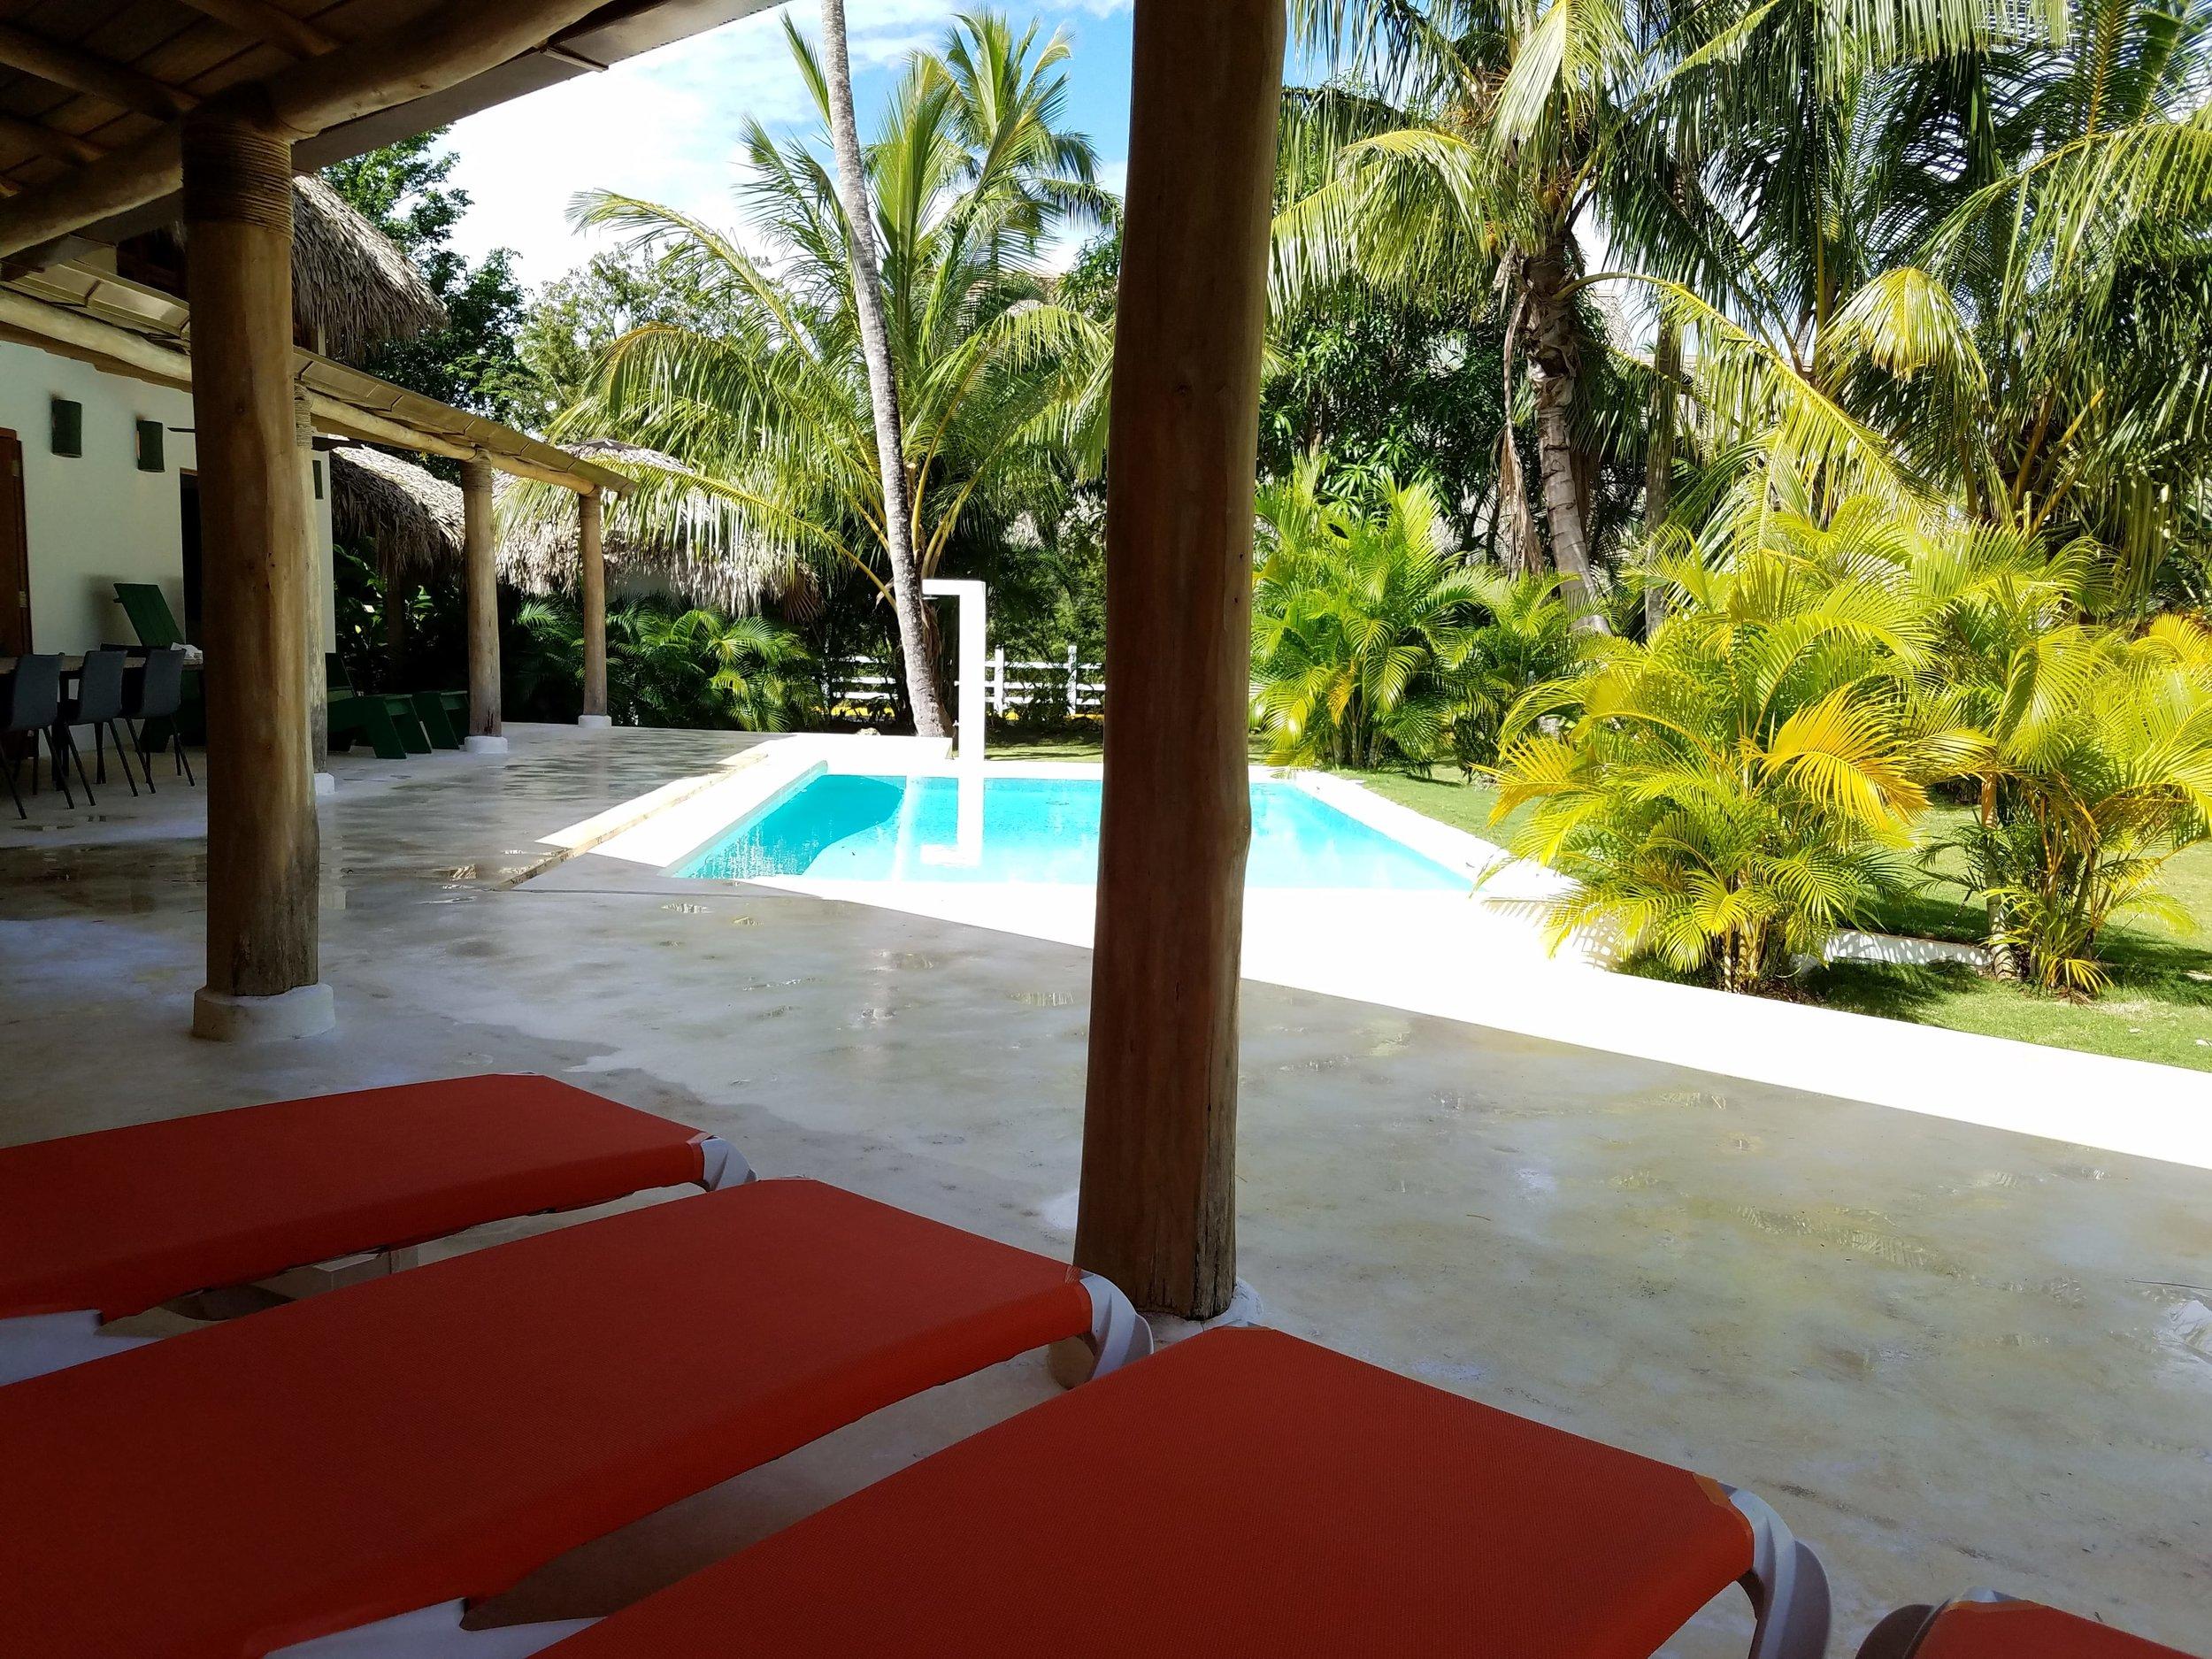 Villa for rent Las Terrenas Cote ci cote la3-min.jpg